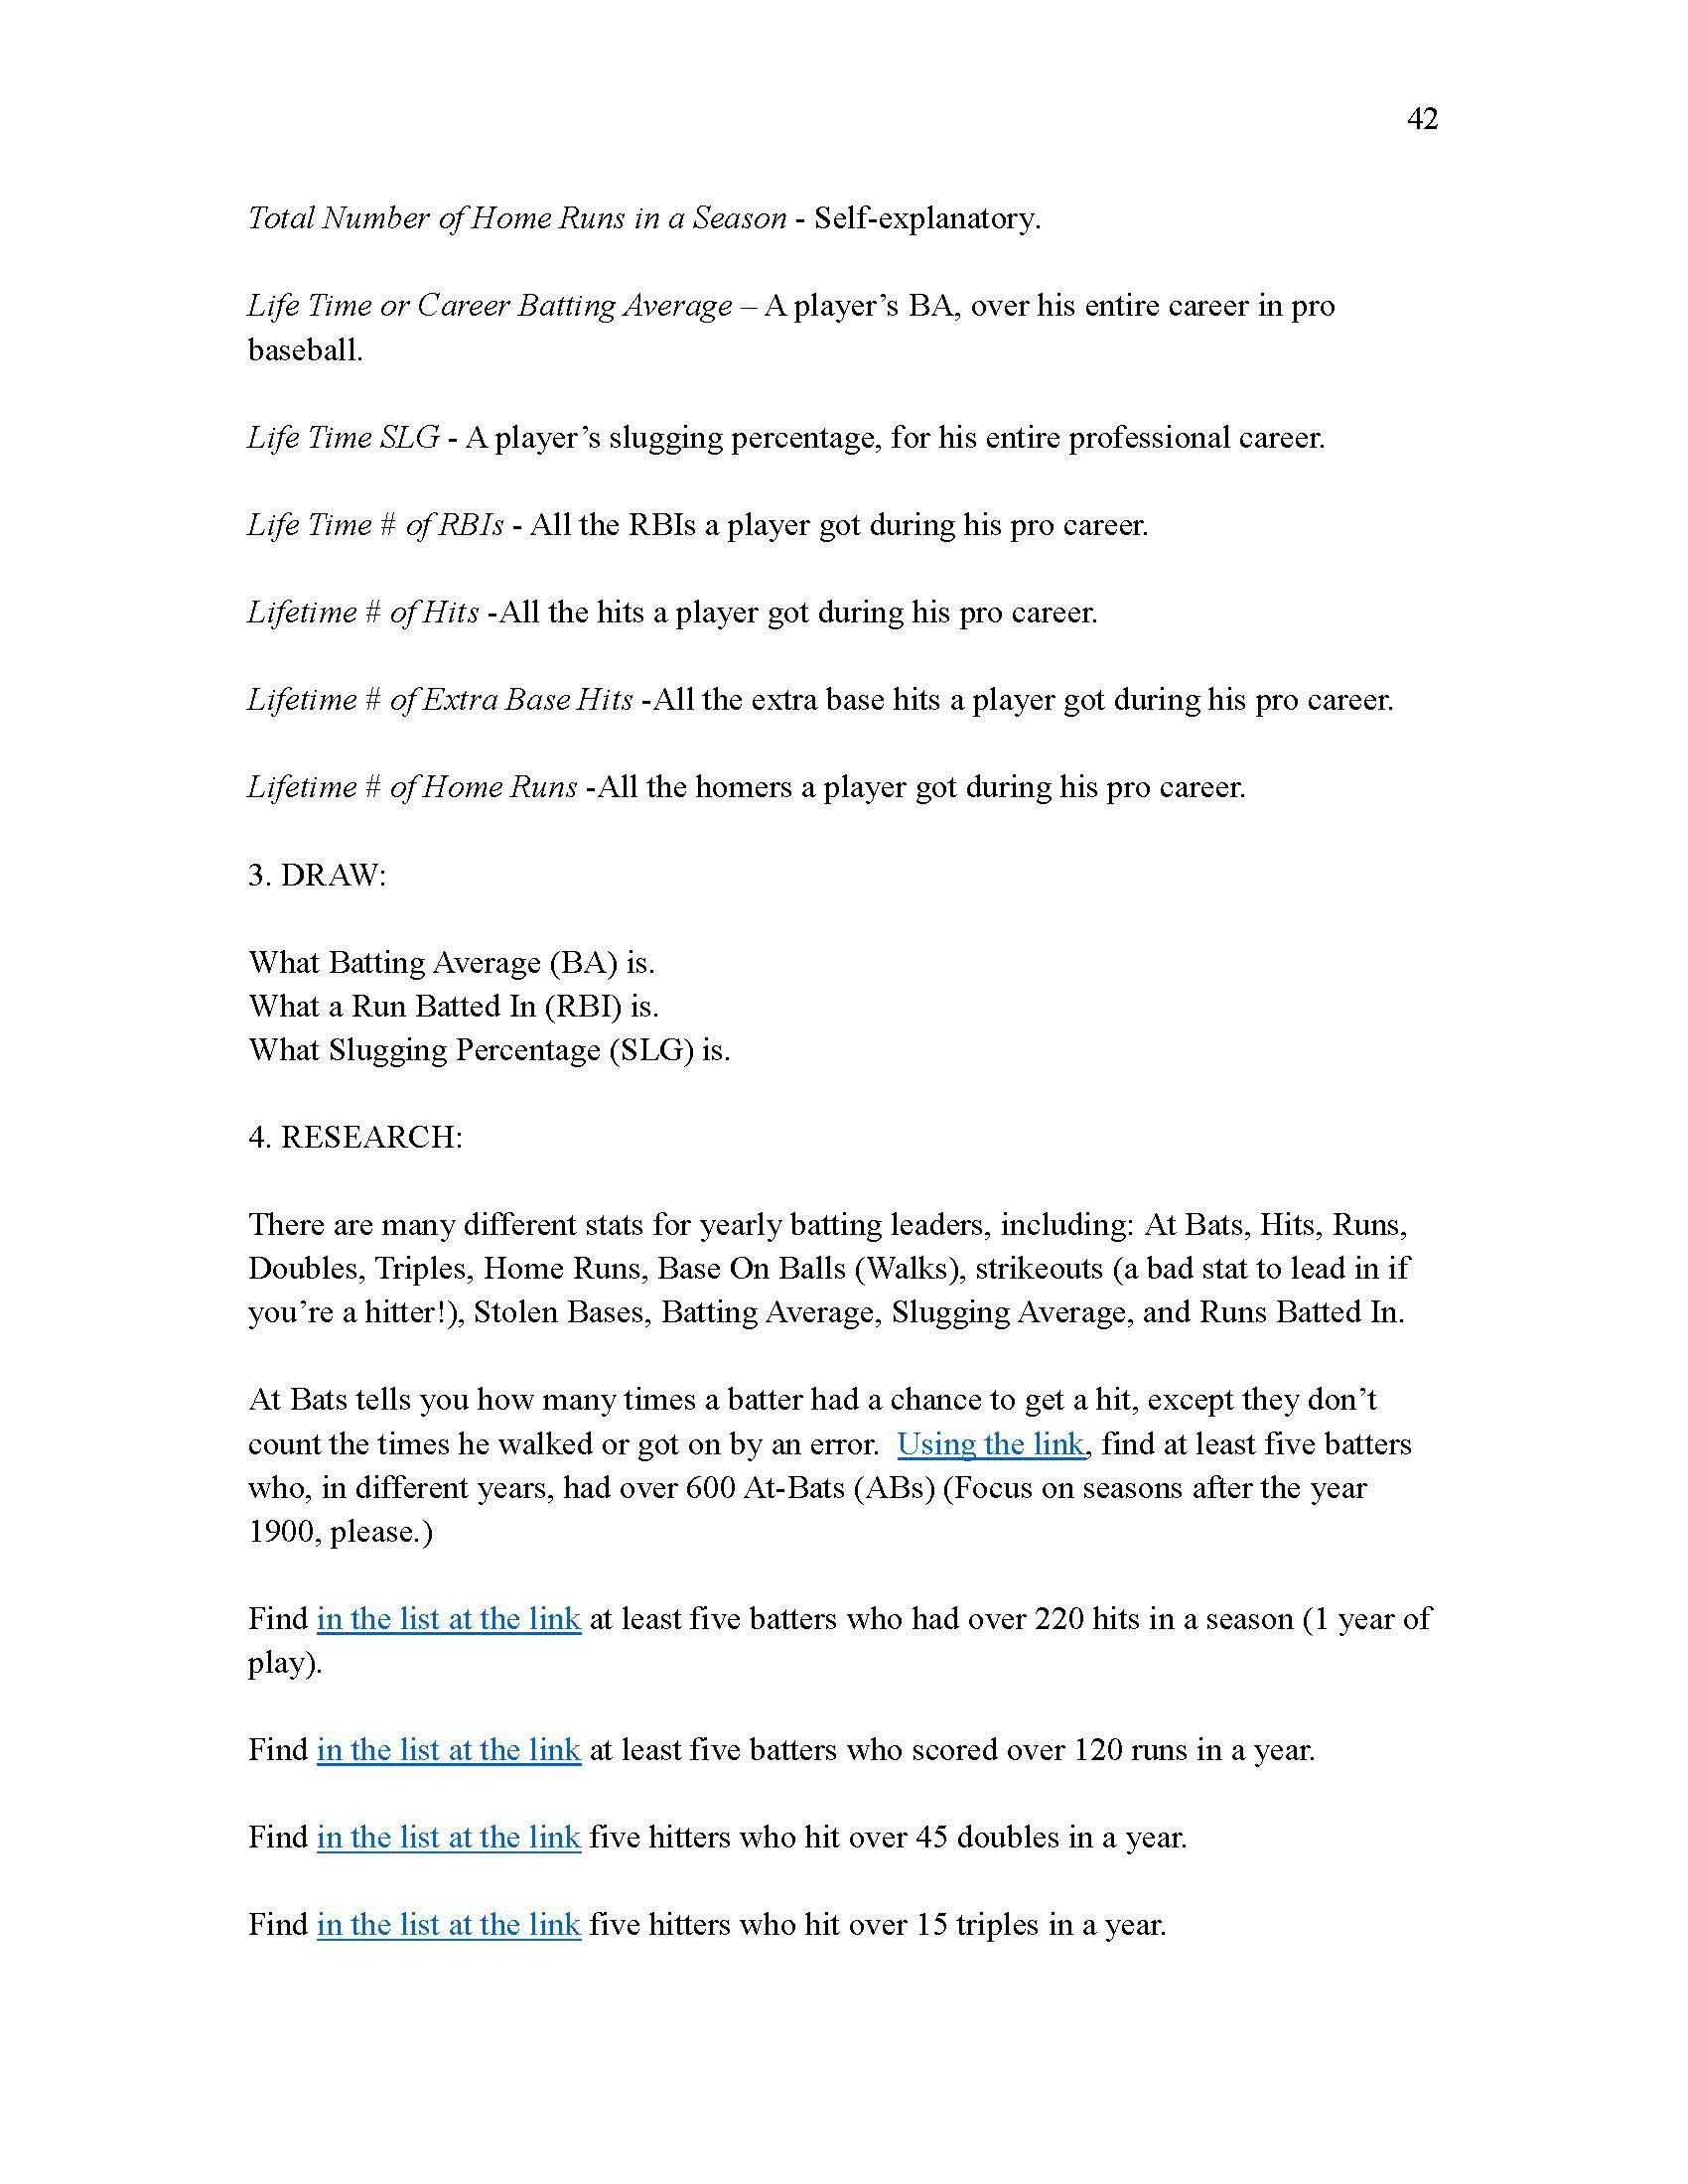 Samples STEP 2-3-4 Baseball P.E. Elective_Page_043.jpg